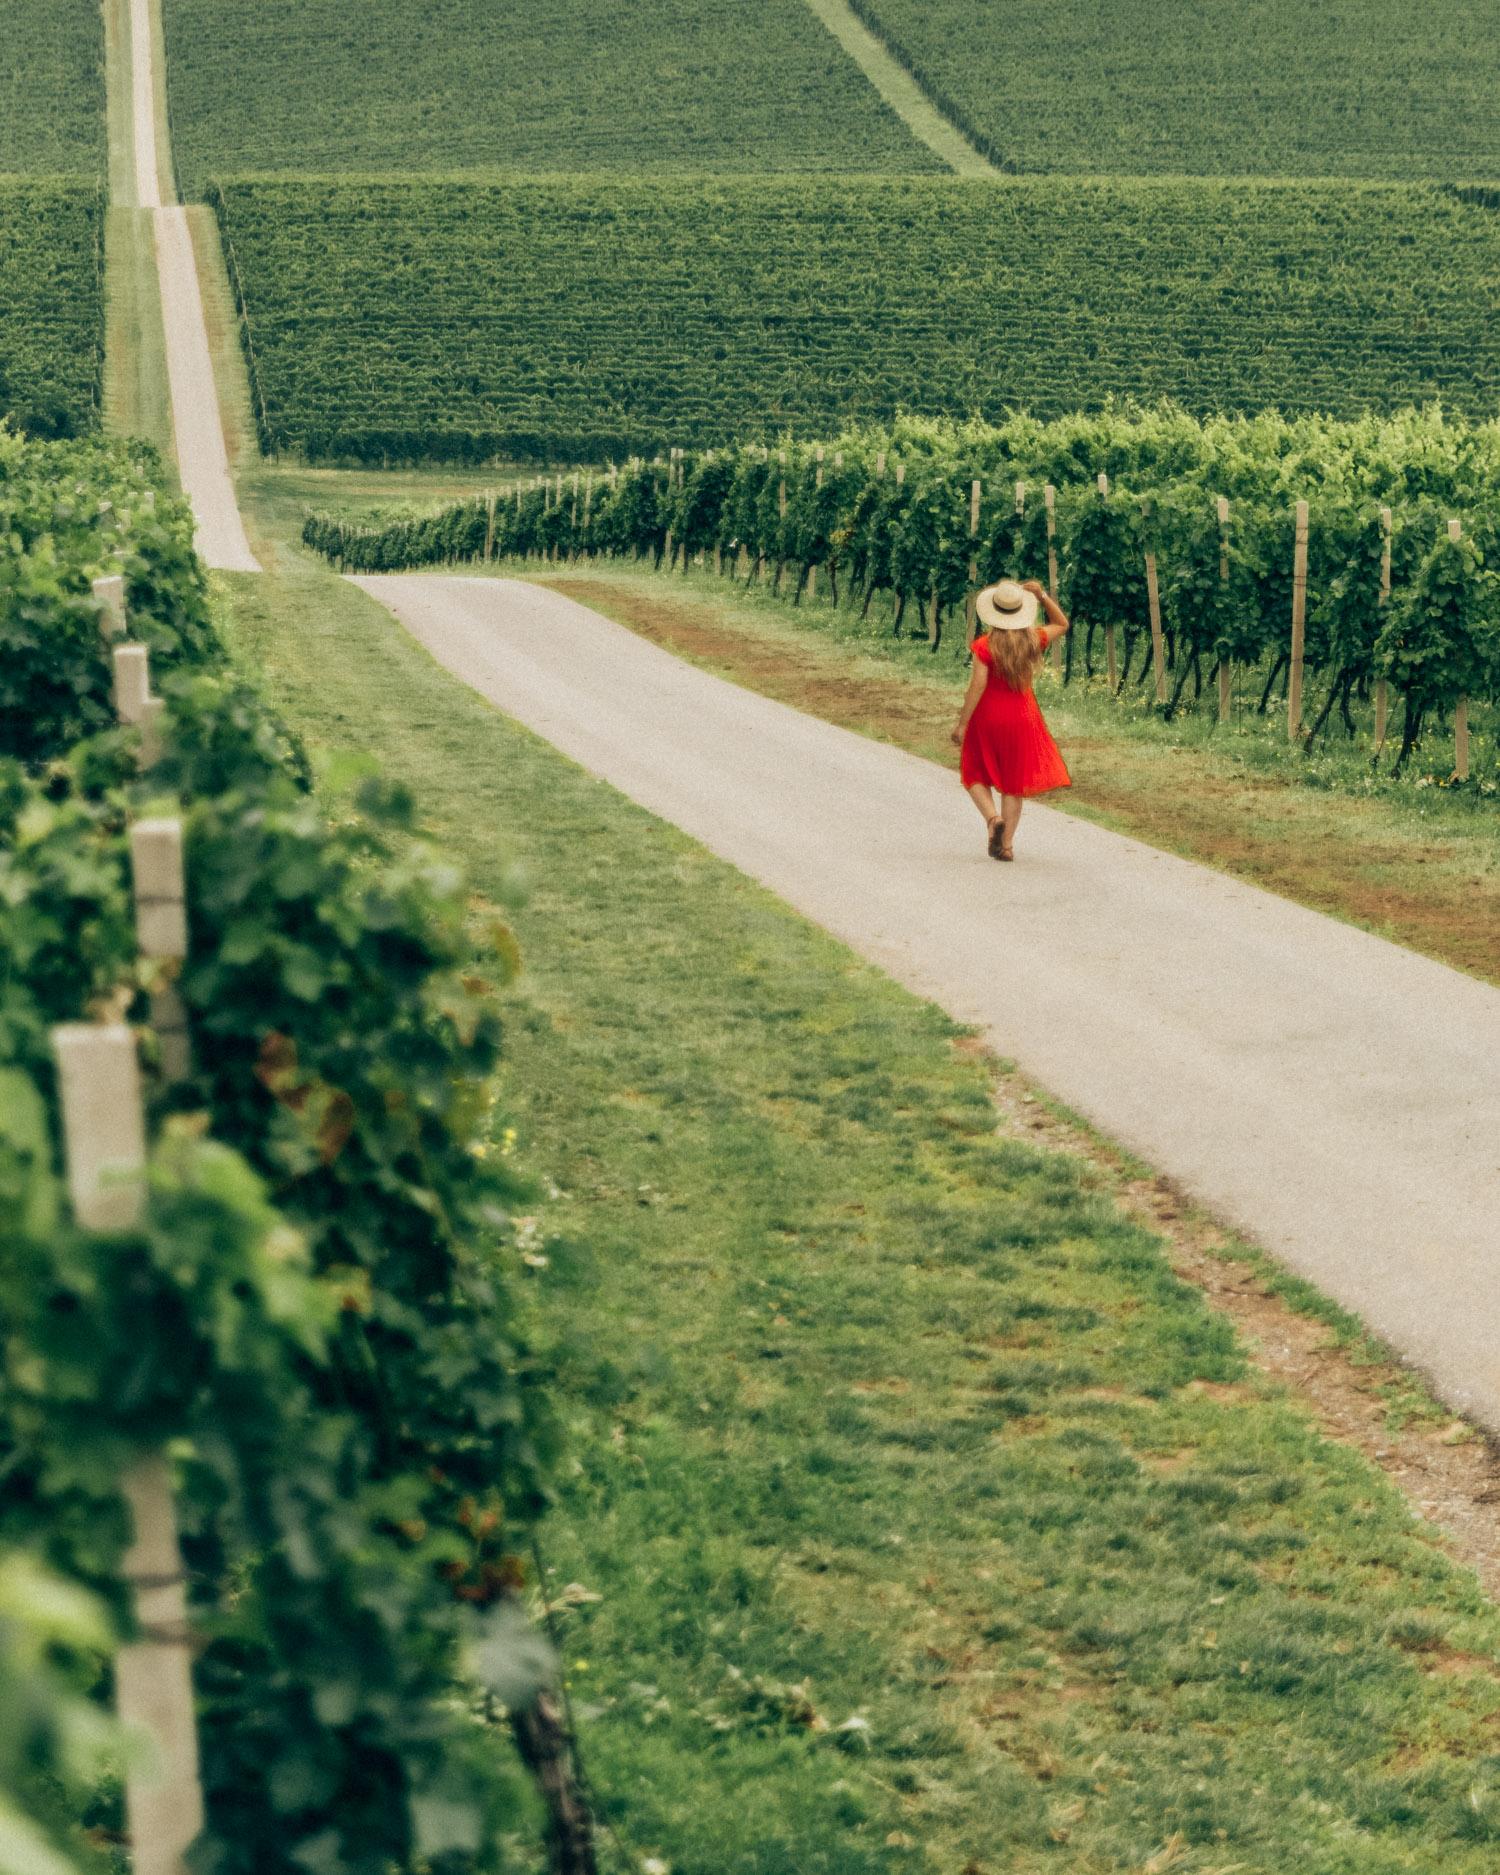 Kneževi Vinogradi Vineyard |Things to Do in Slavonia